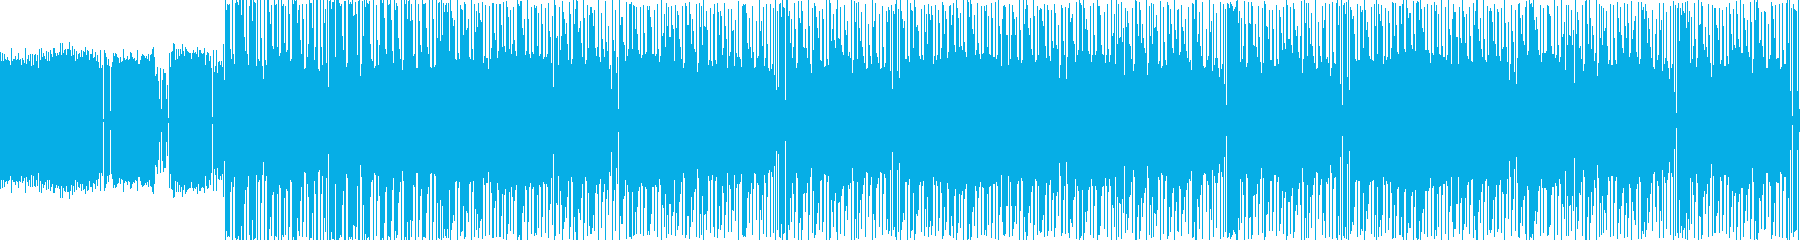 【EDM/ダブステップ/ダンスイベント】の再生済みの波形